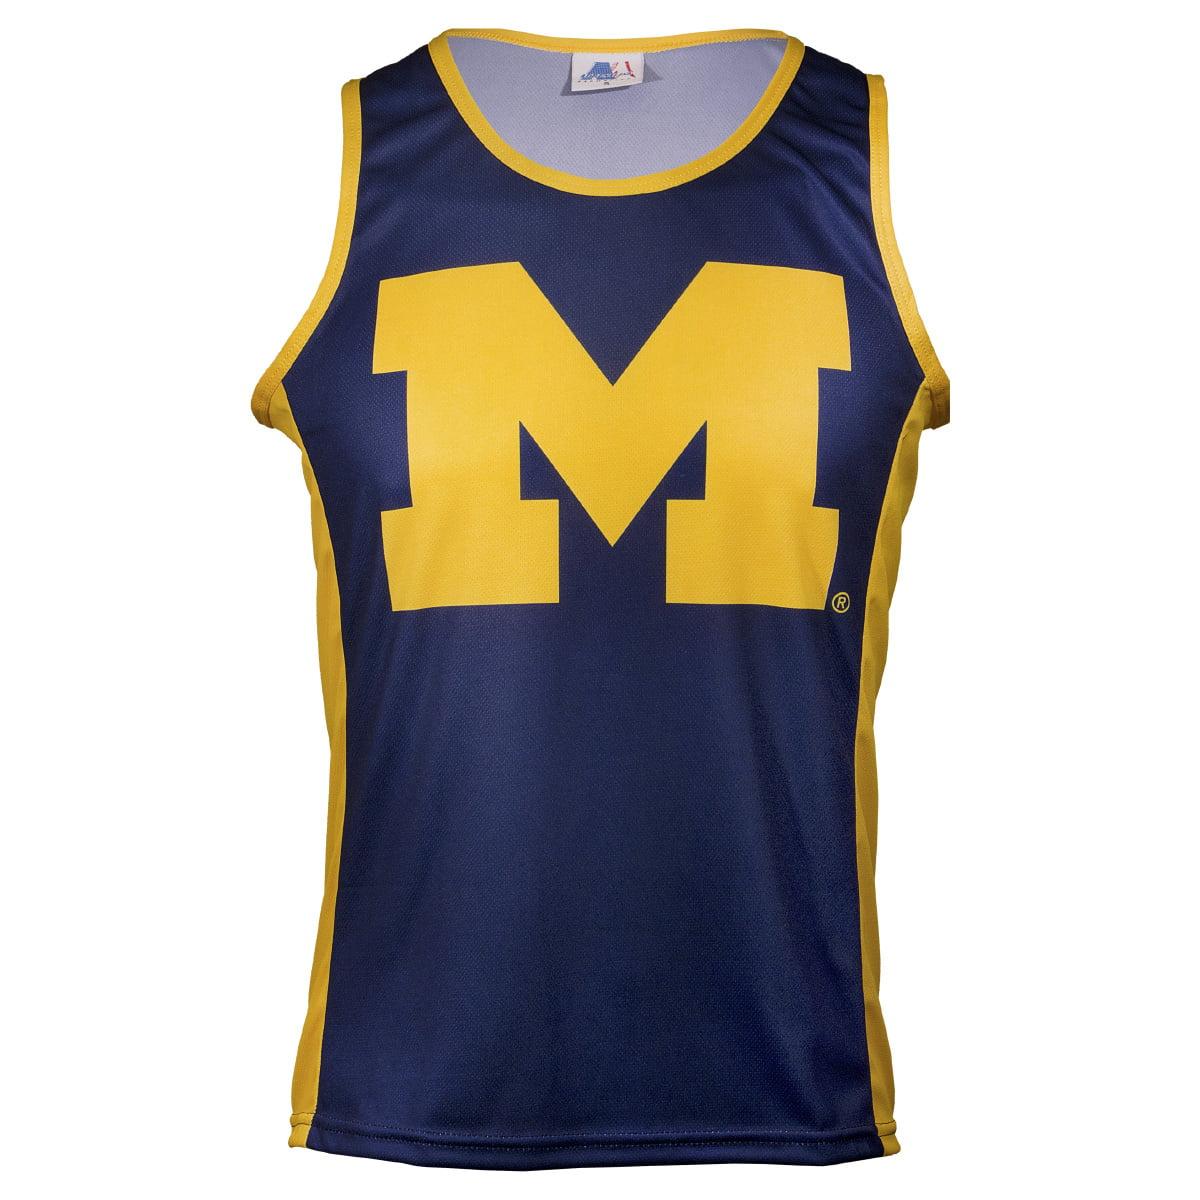 Adrenaline Promotions University of Michigan Run/Tri Singlet